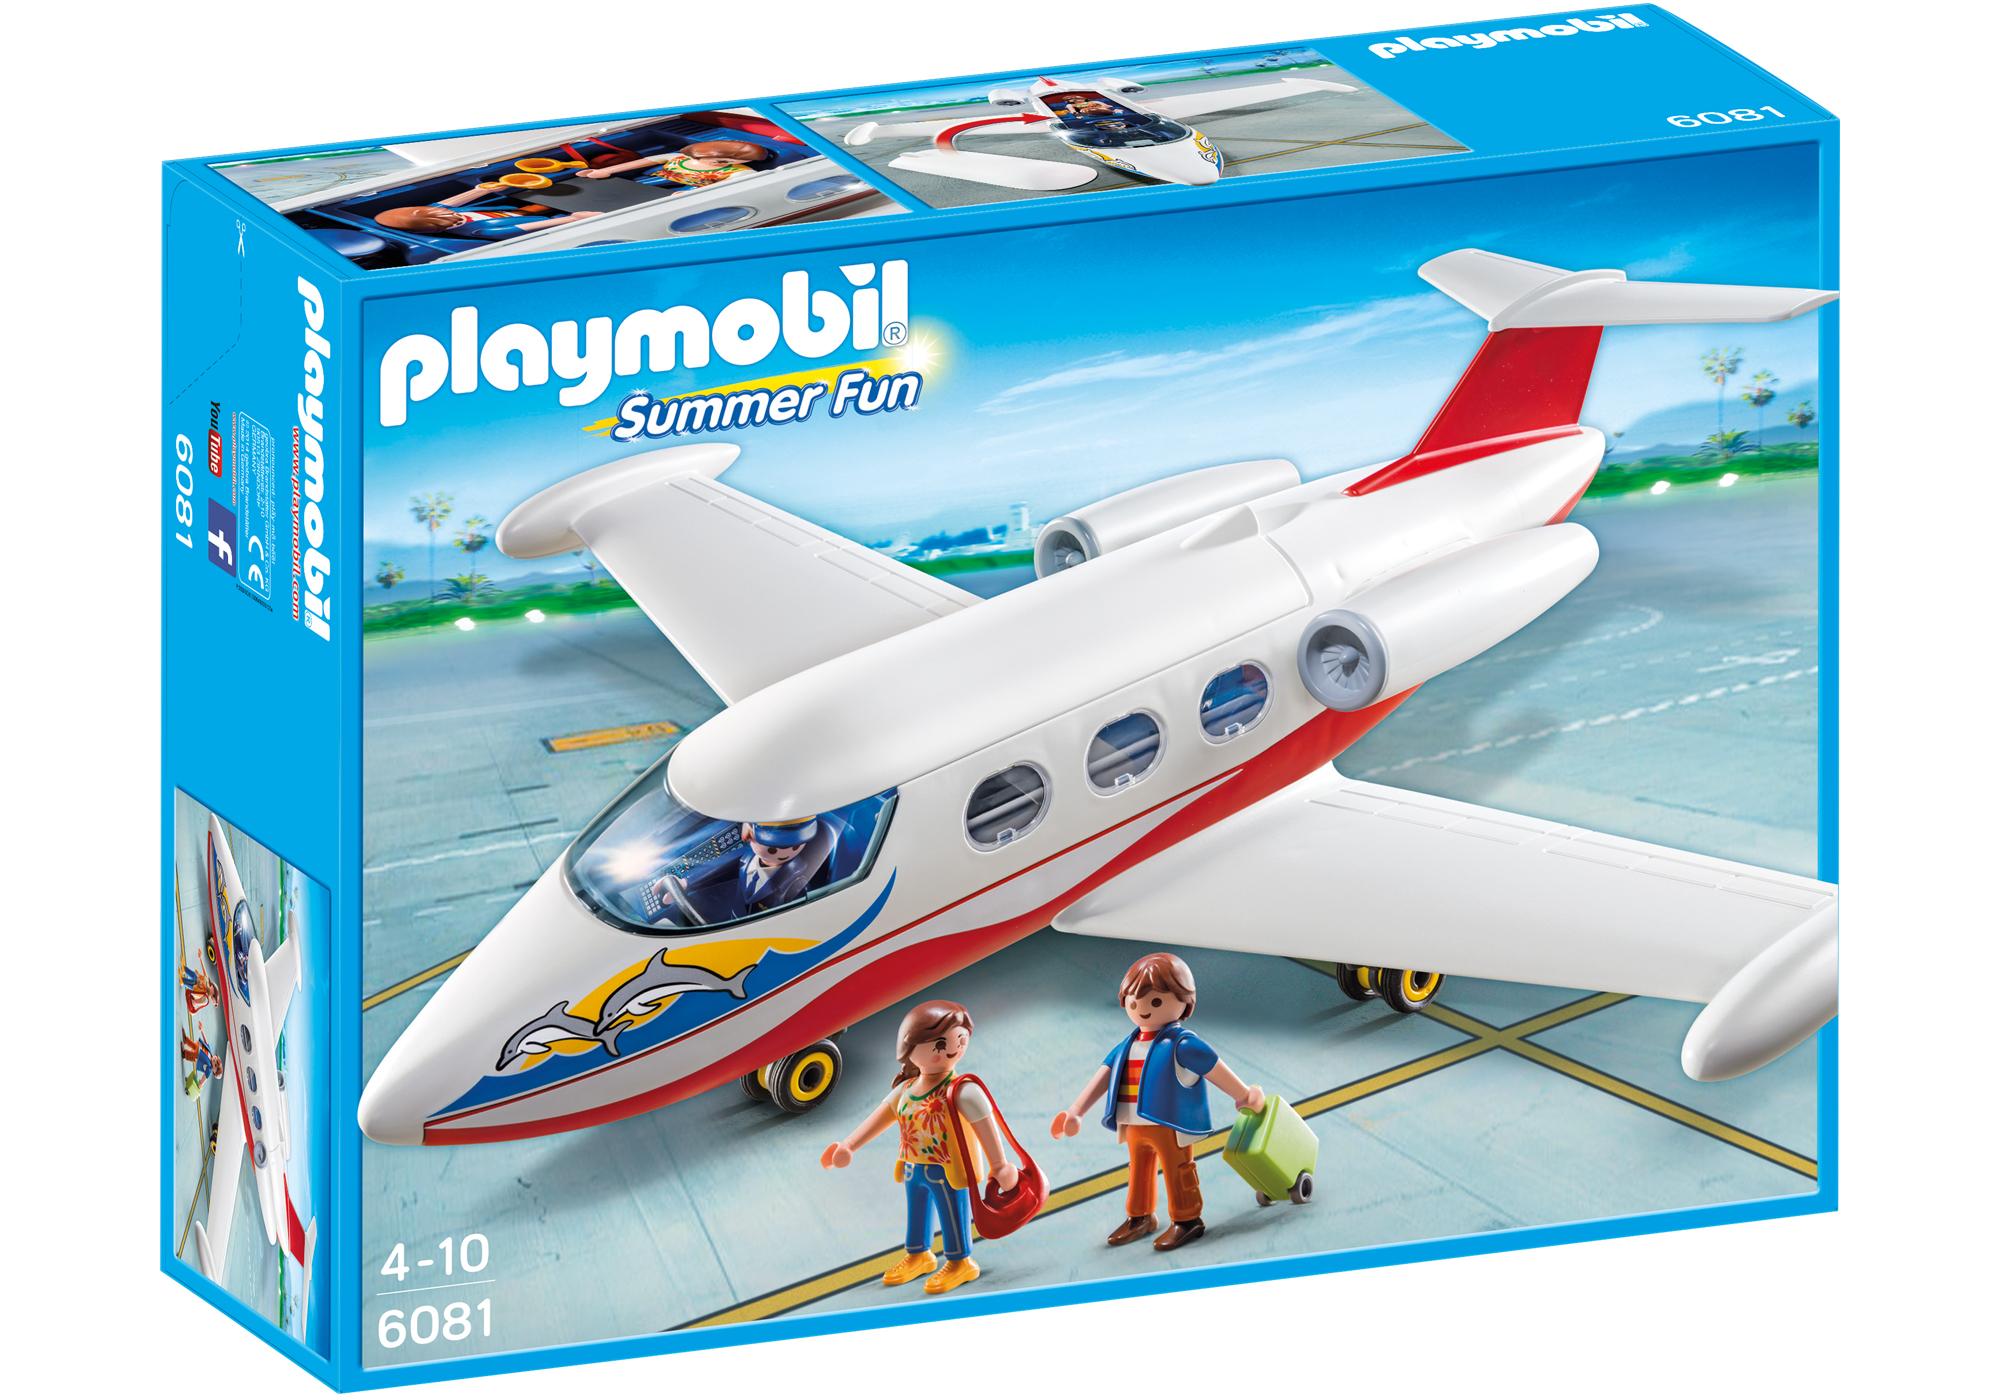 http://media.playmobil.com/i/playmobil/6081_product_box_front/Summer Jet